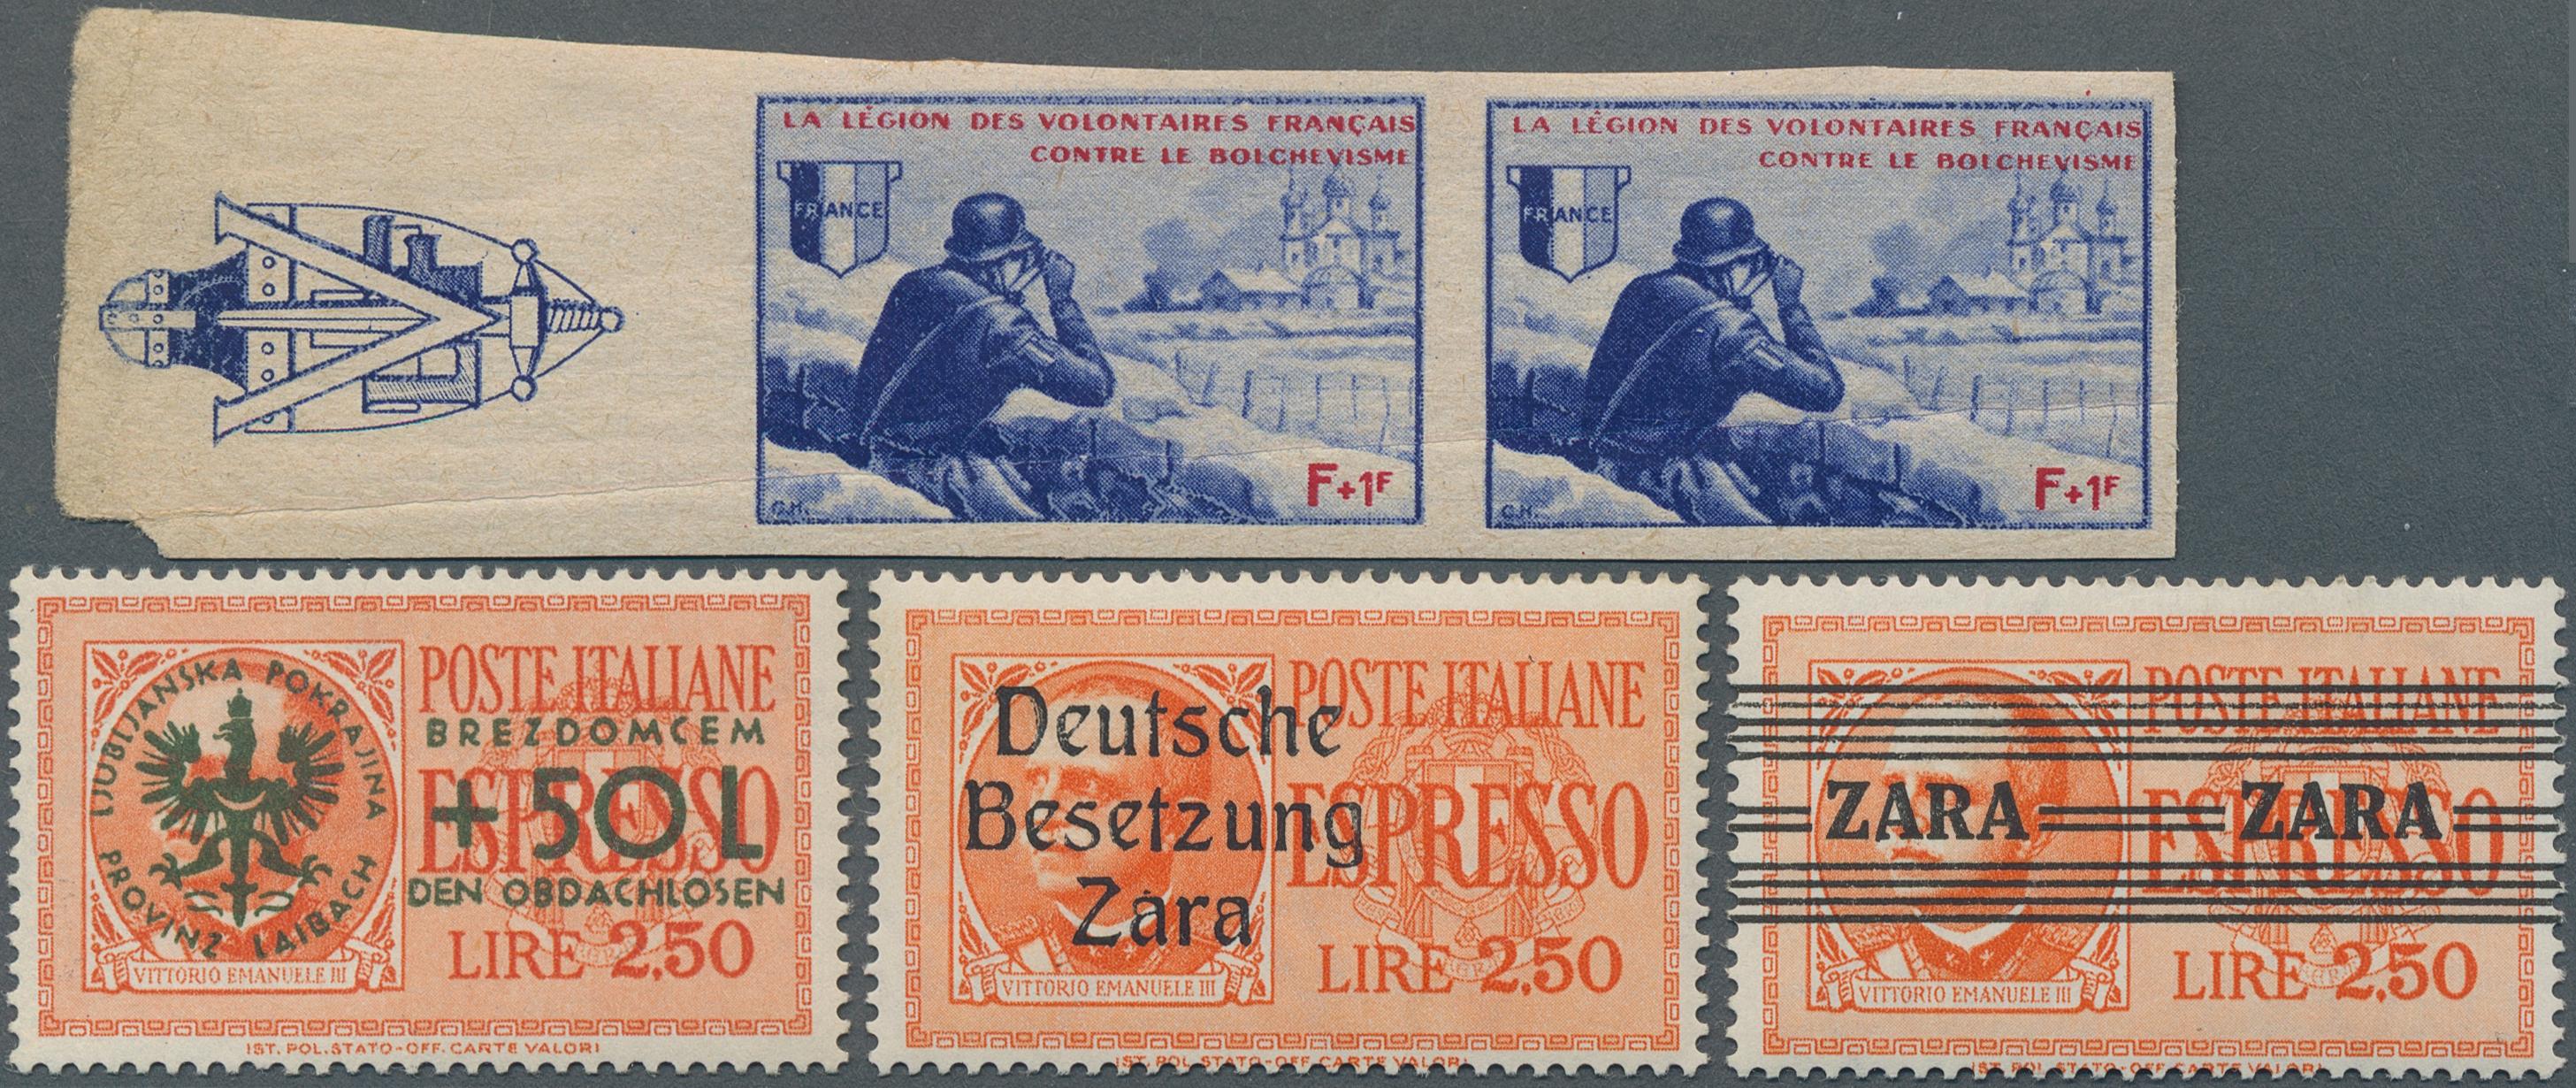 Lot 37091 - deutsche besetzung ii. wk  -  Auktionshaus Christoph Gärtner GmbH & Co. KG Sale #44 Collections Germany